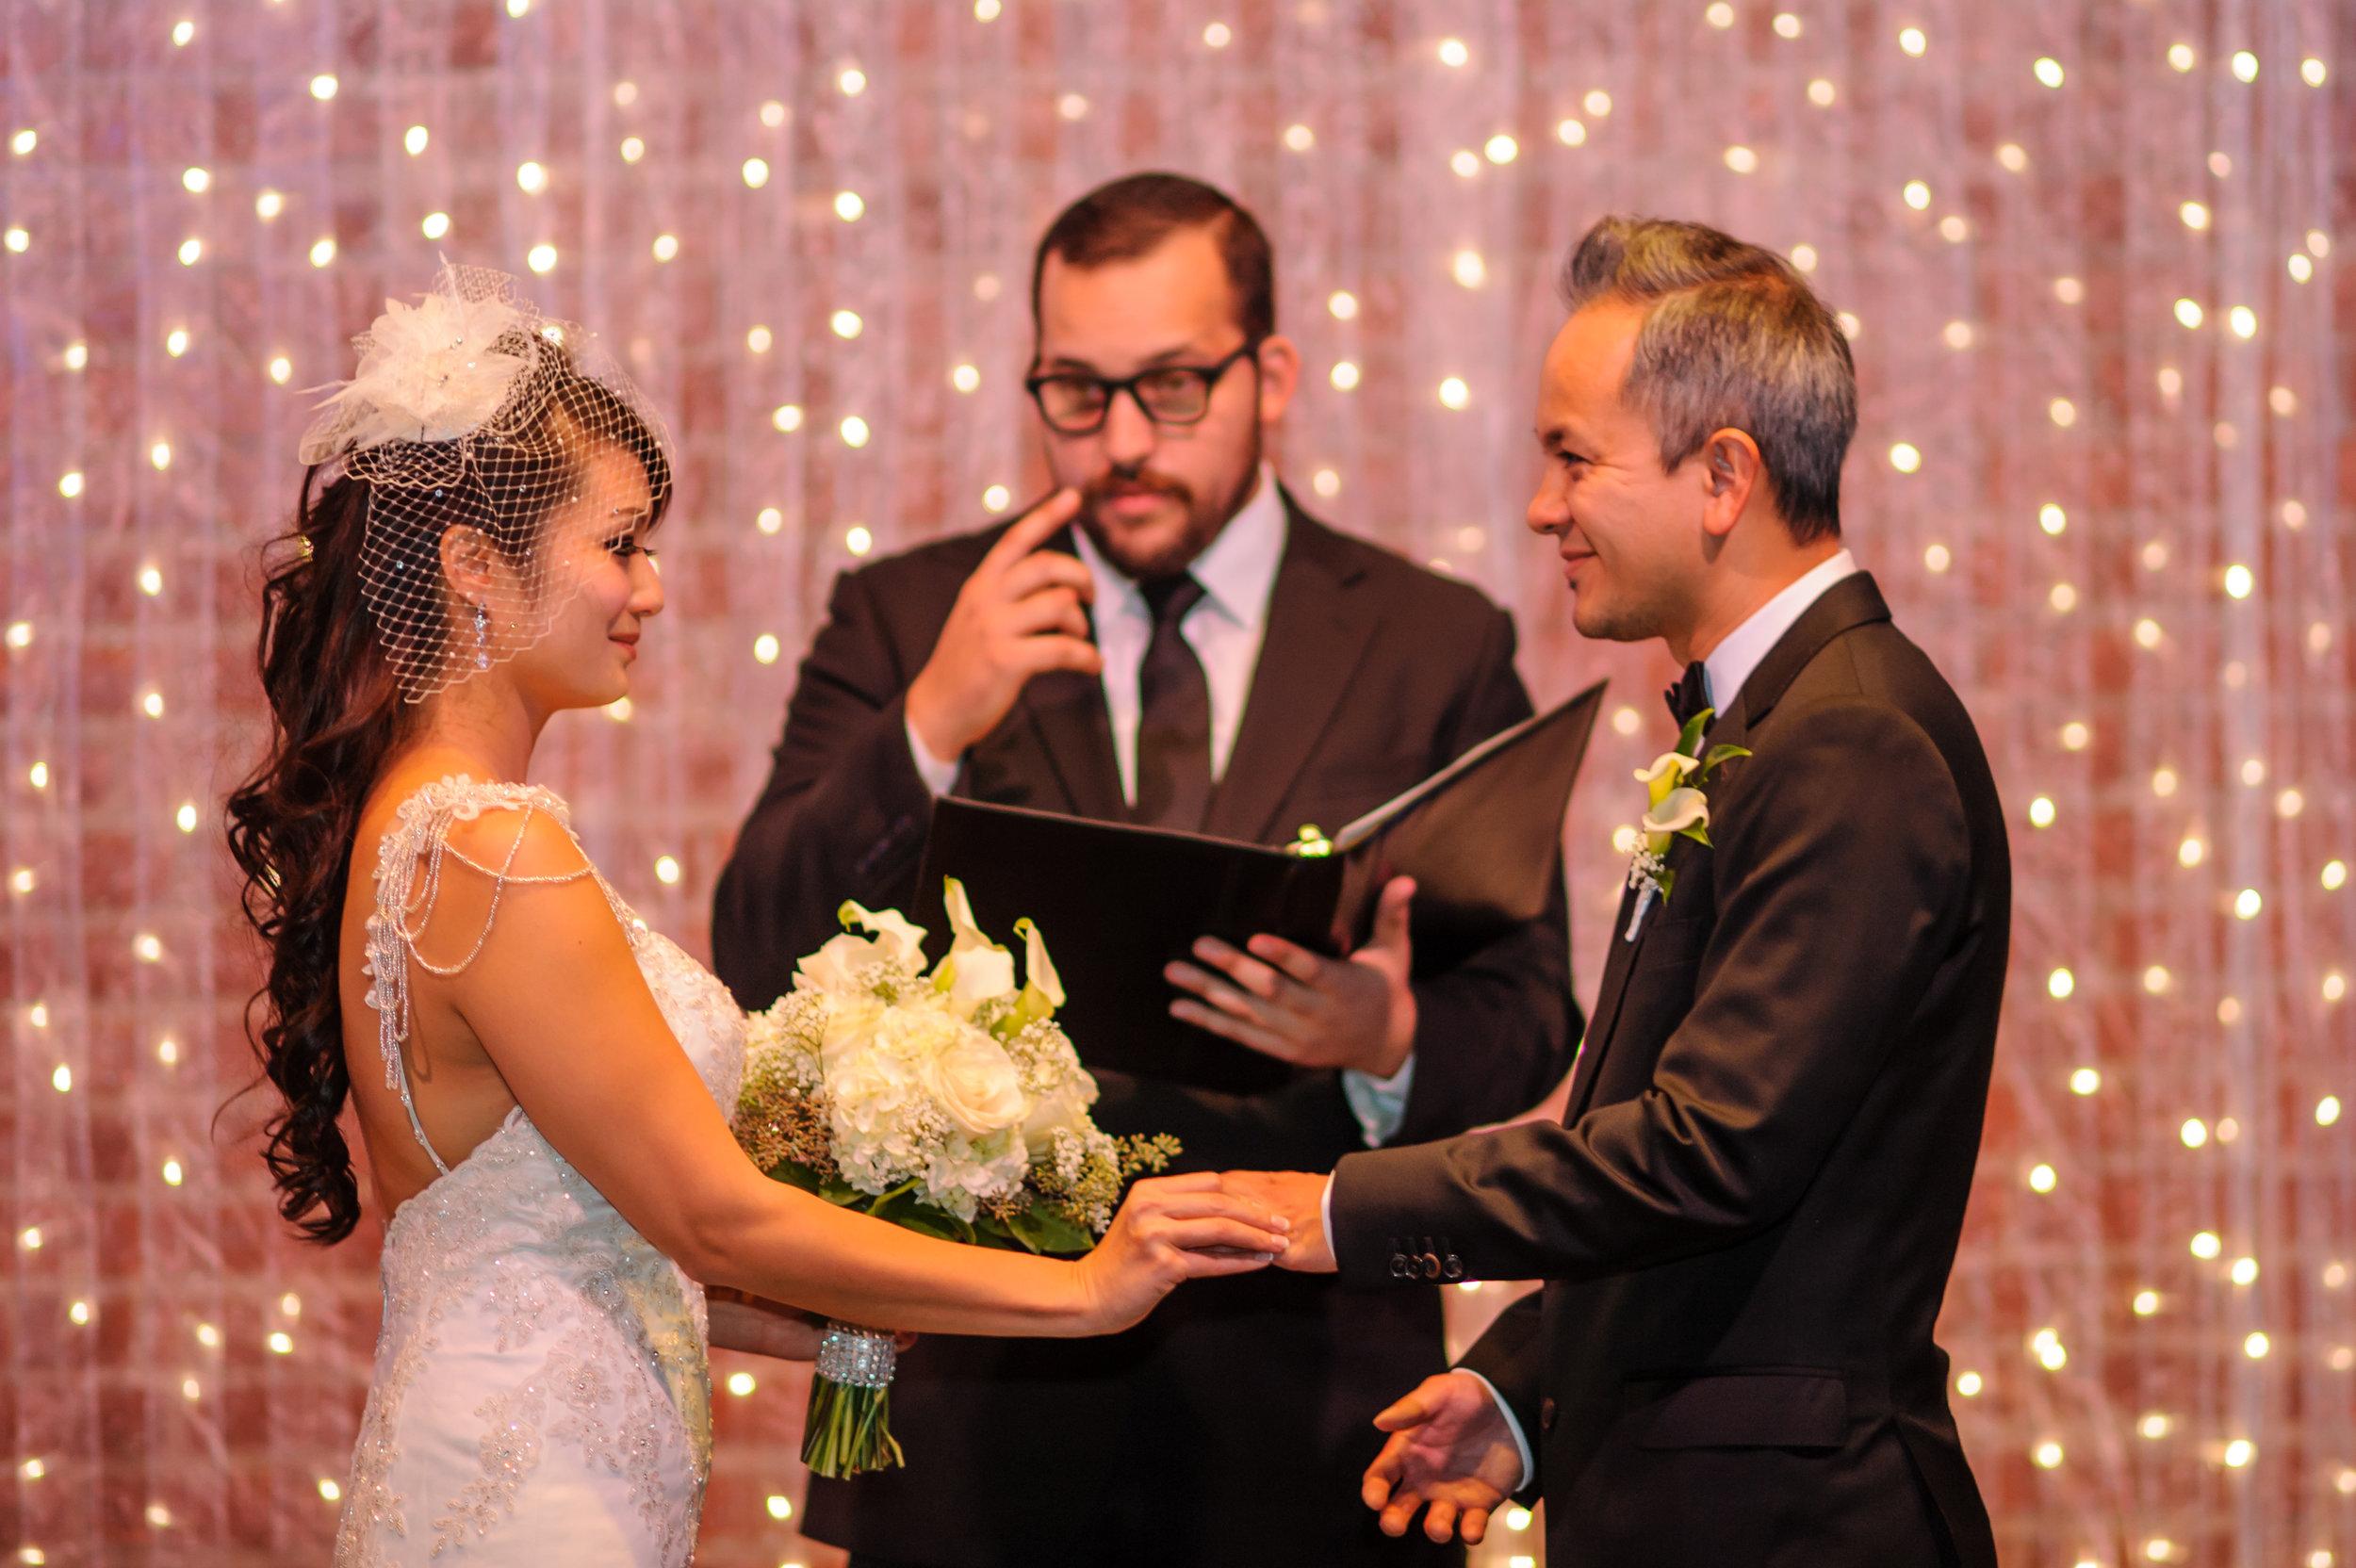 camilla-thuy-099-memorial-auditorium-sacramento-wedding-photographer-katherine-nicole-photography.JPG